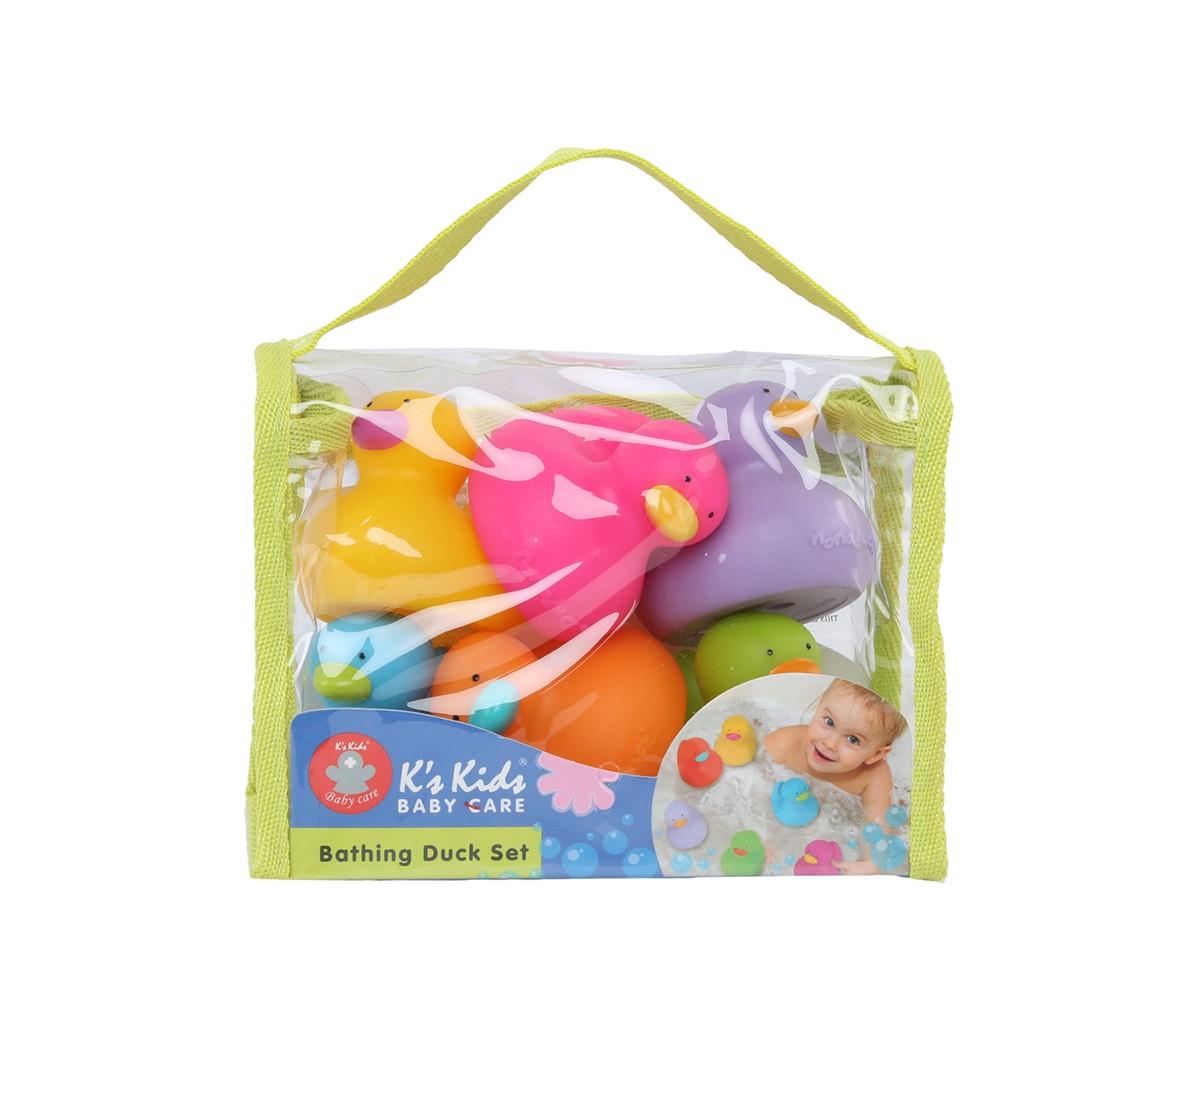 K'S Kids Bathing Duck Set Bath Toys & Accessories for Kids age 2Y+